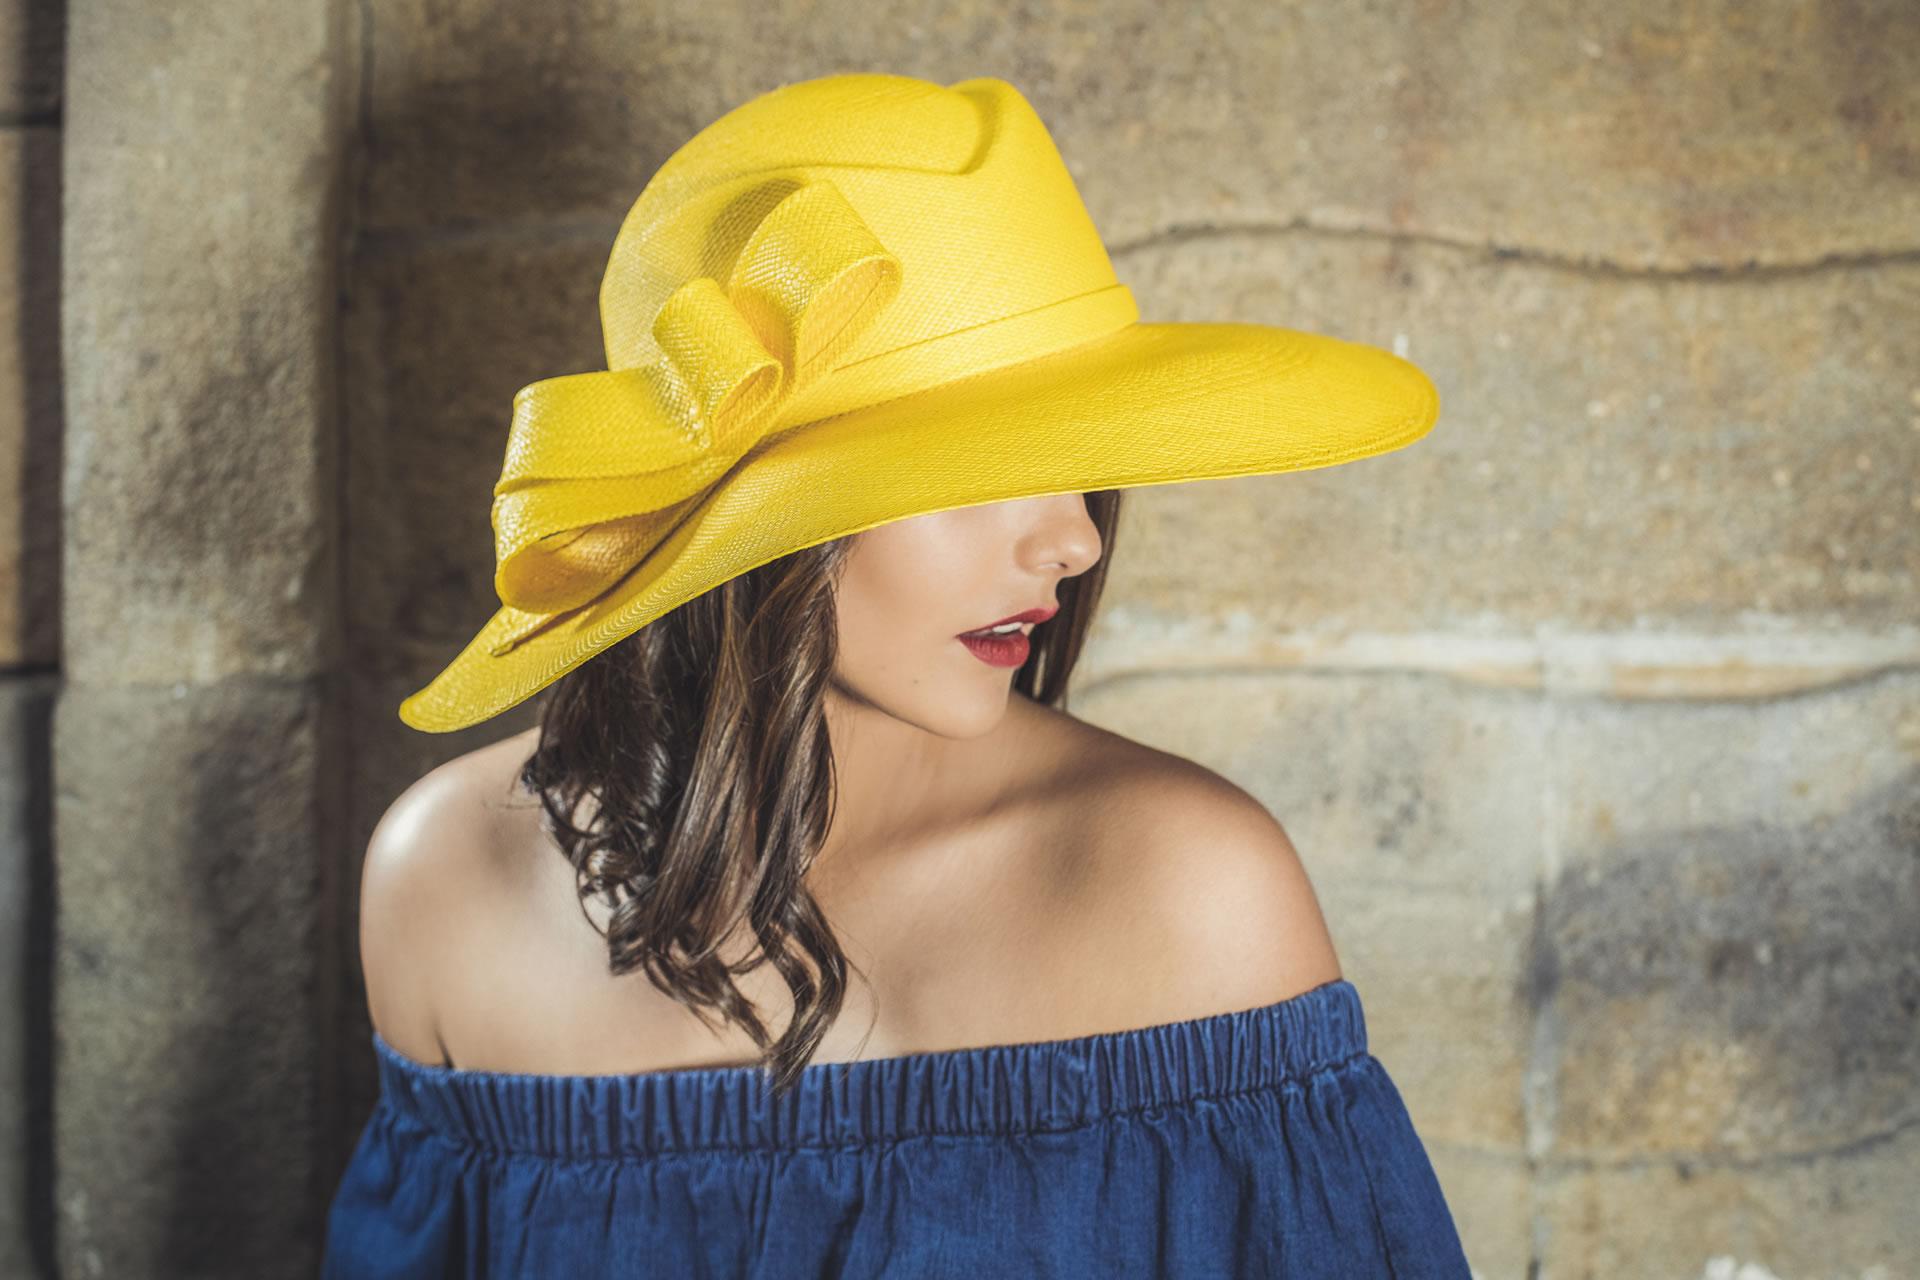 Homero Ortega Panama Hats - Cuenca 3f31b56c8b5